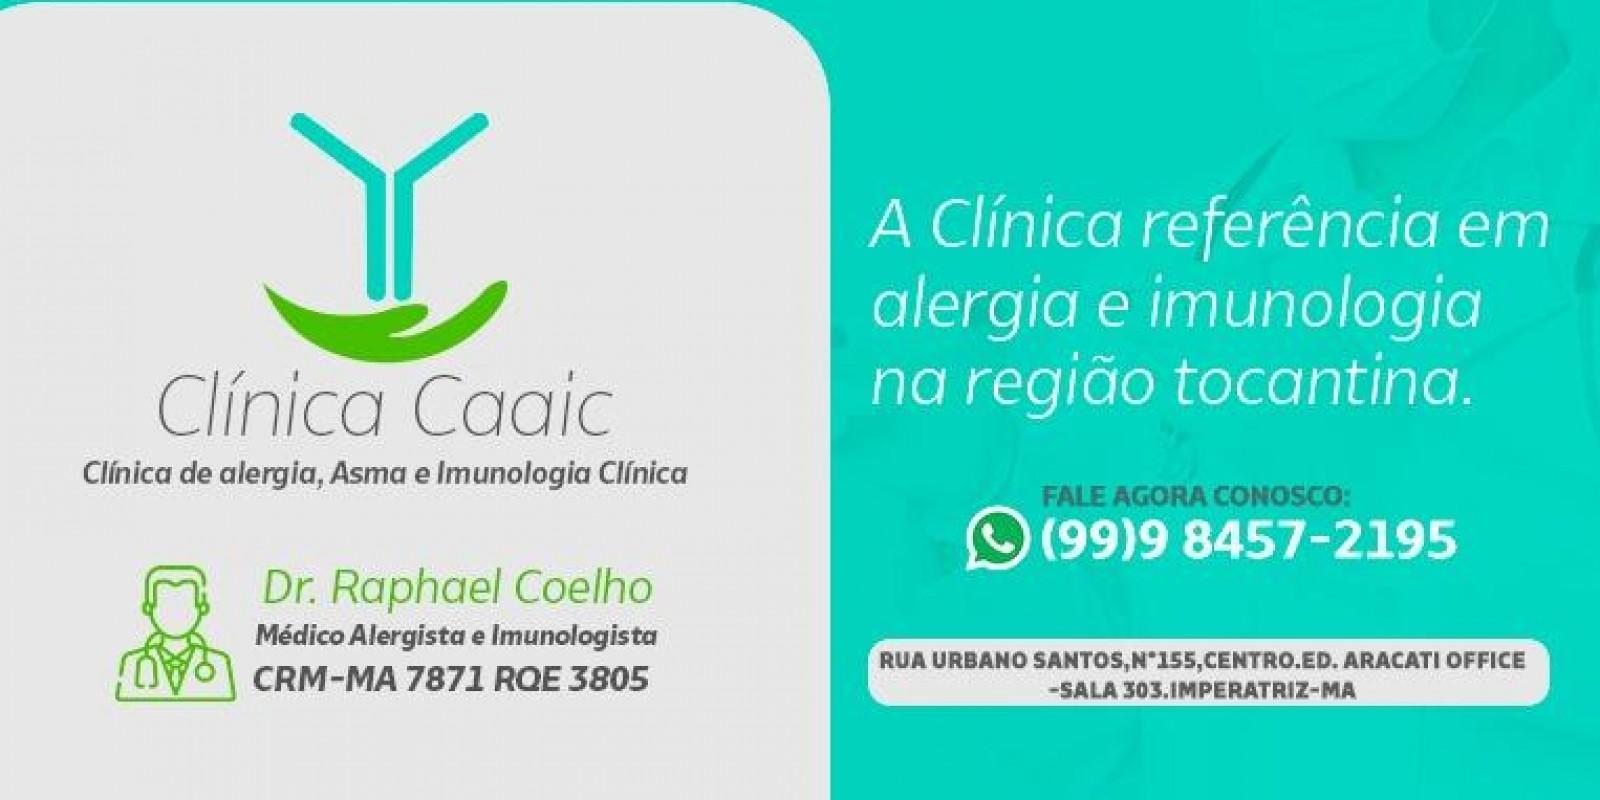 CAAIC - Clínica de Alergia e Imunologia Clínica